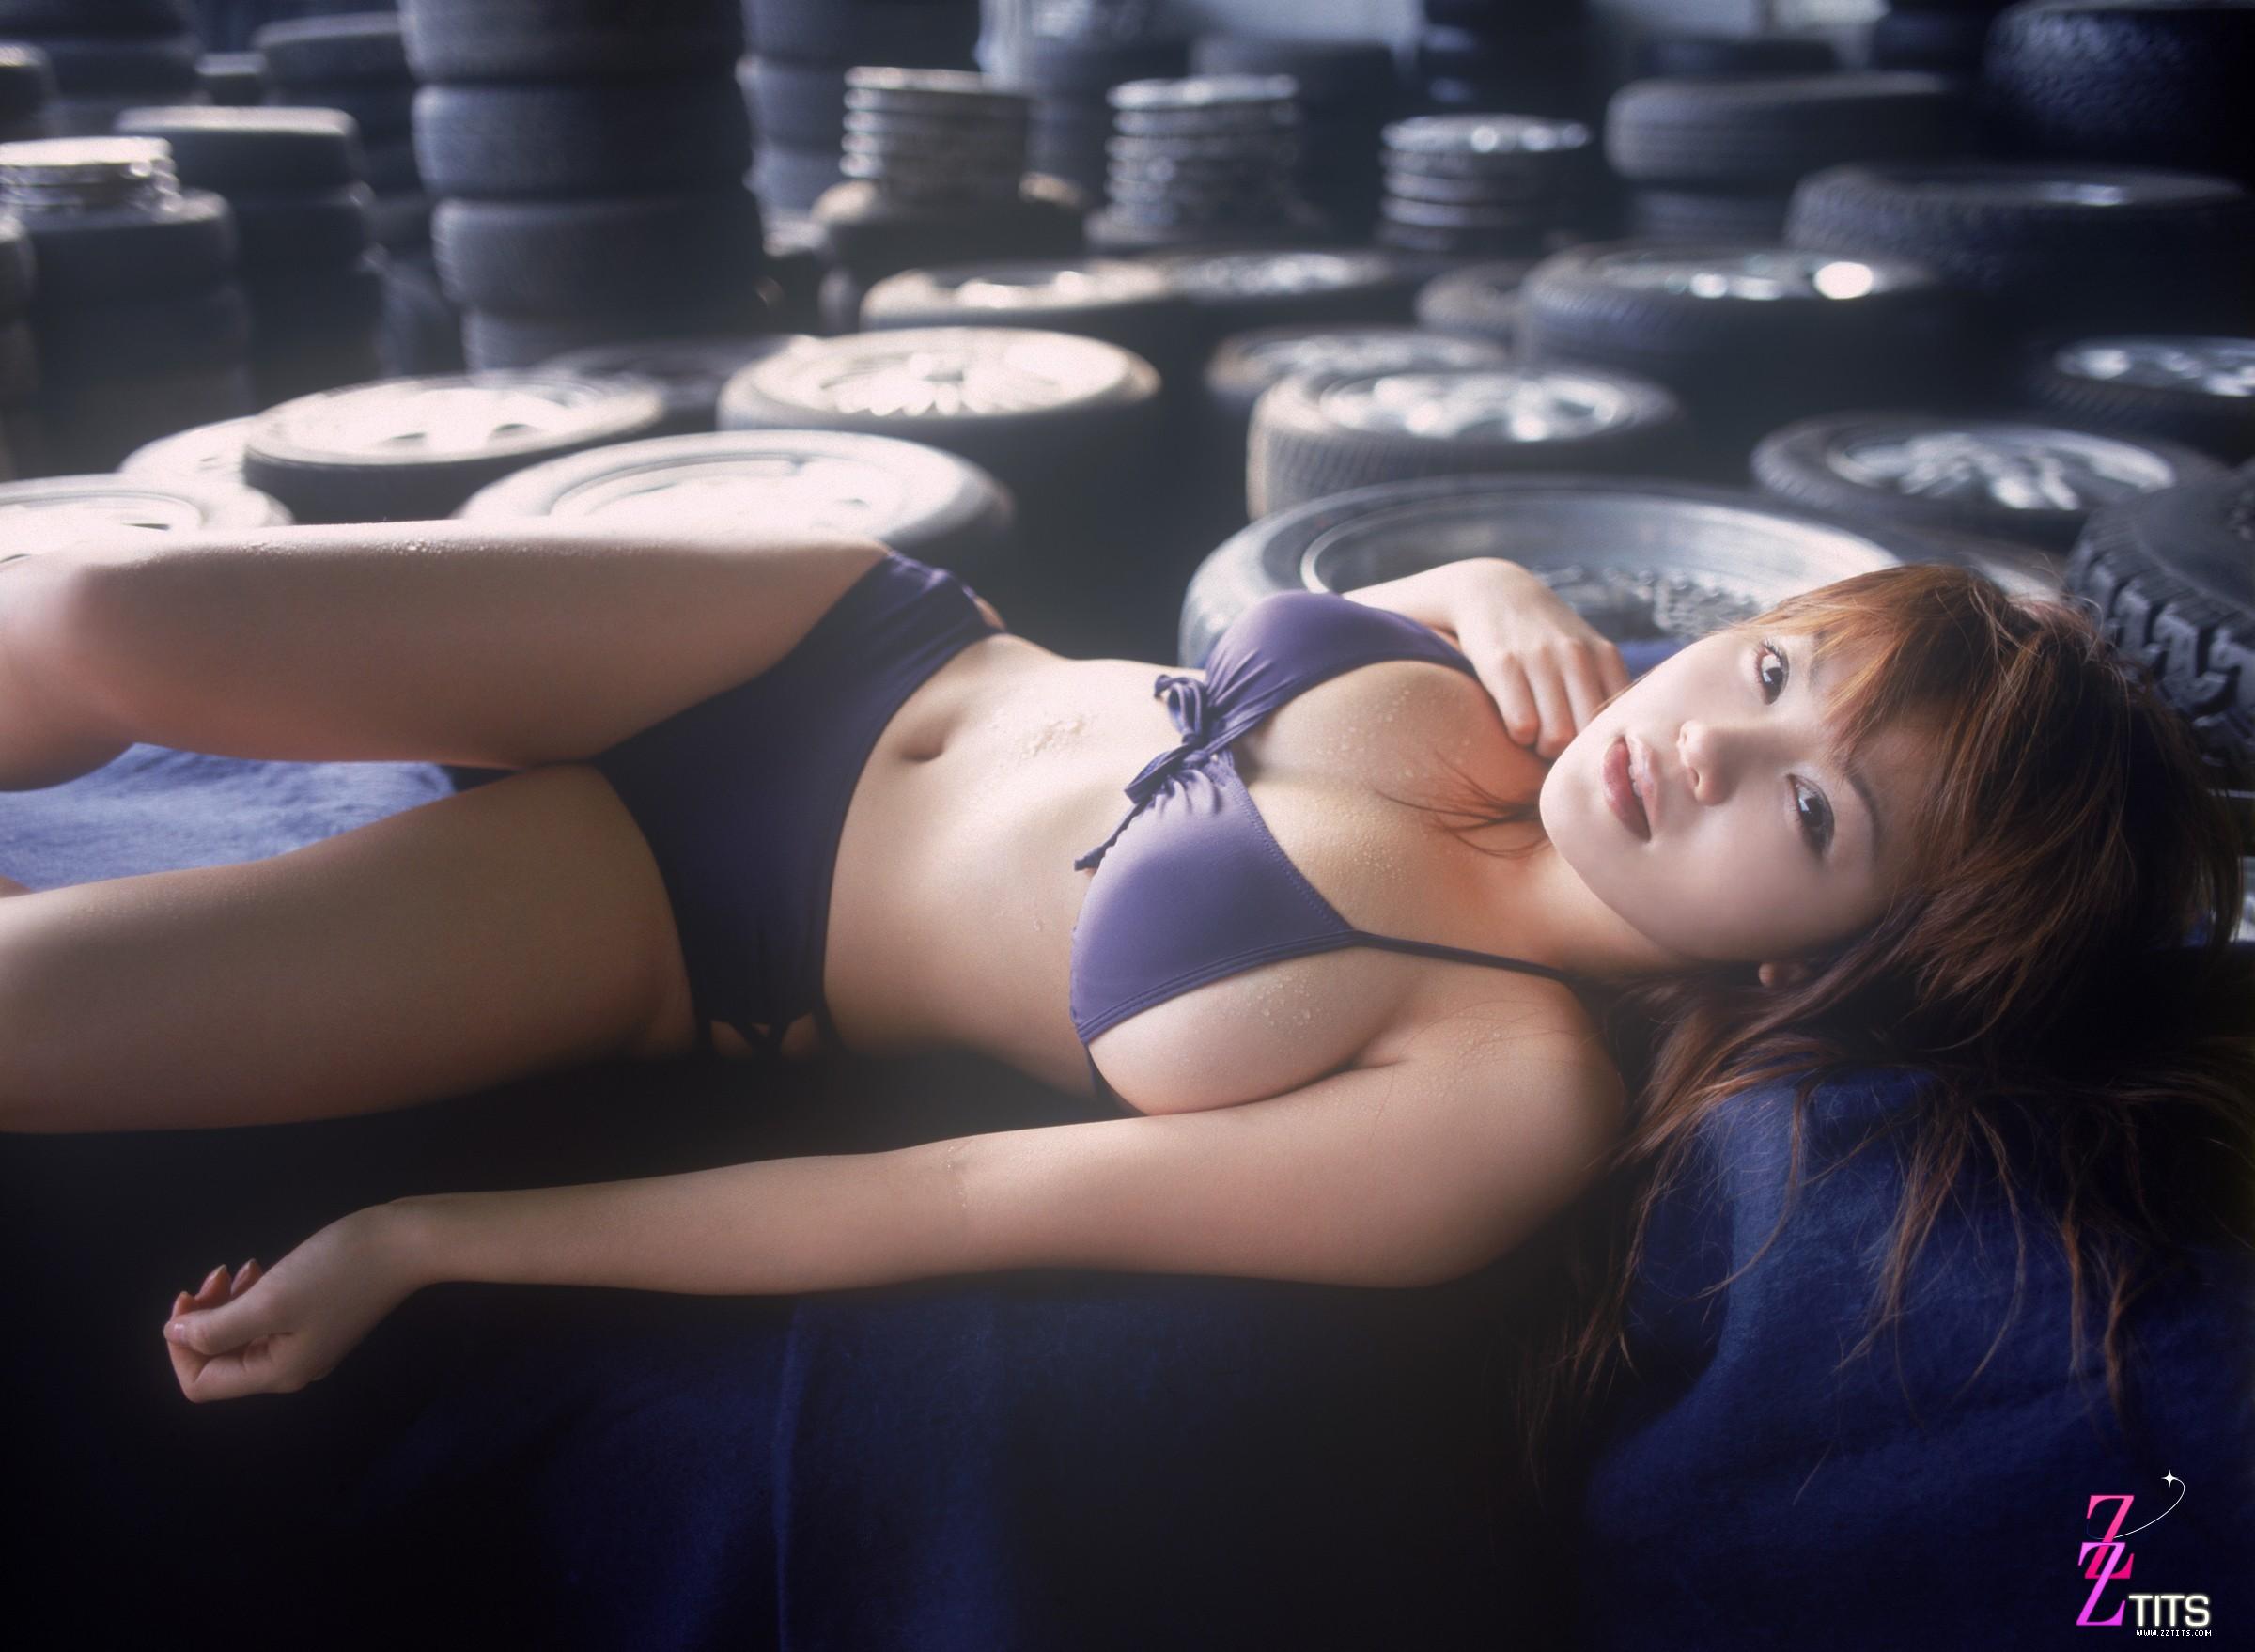 Yoko matsugane recent nude boob photo really. All